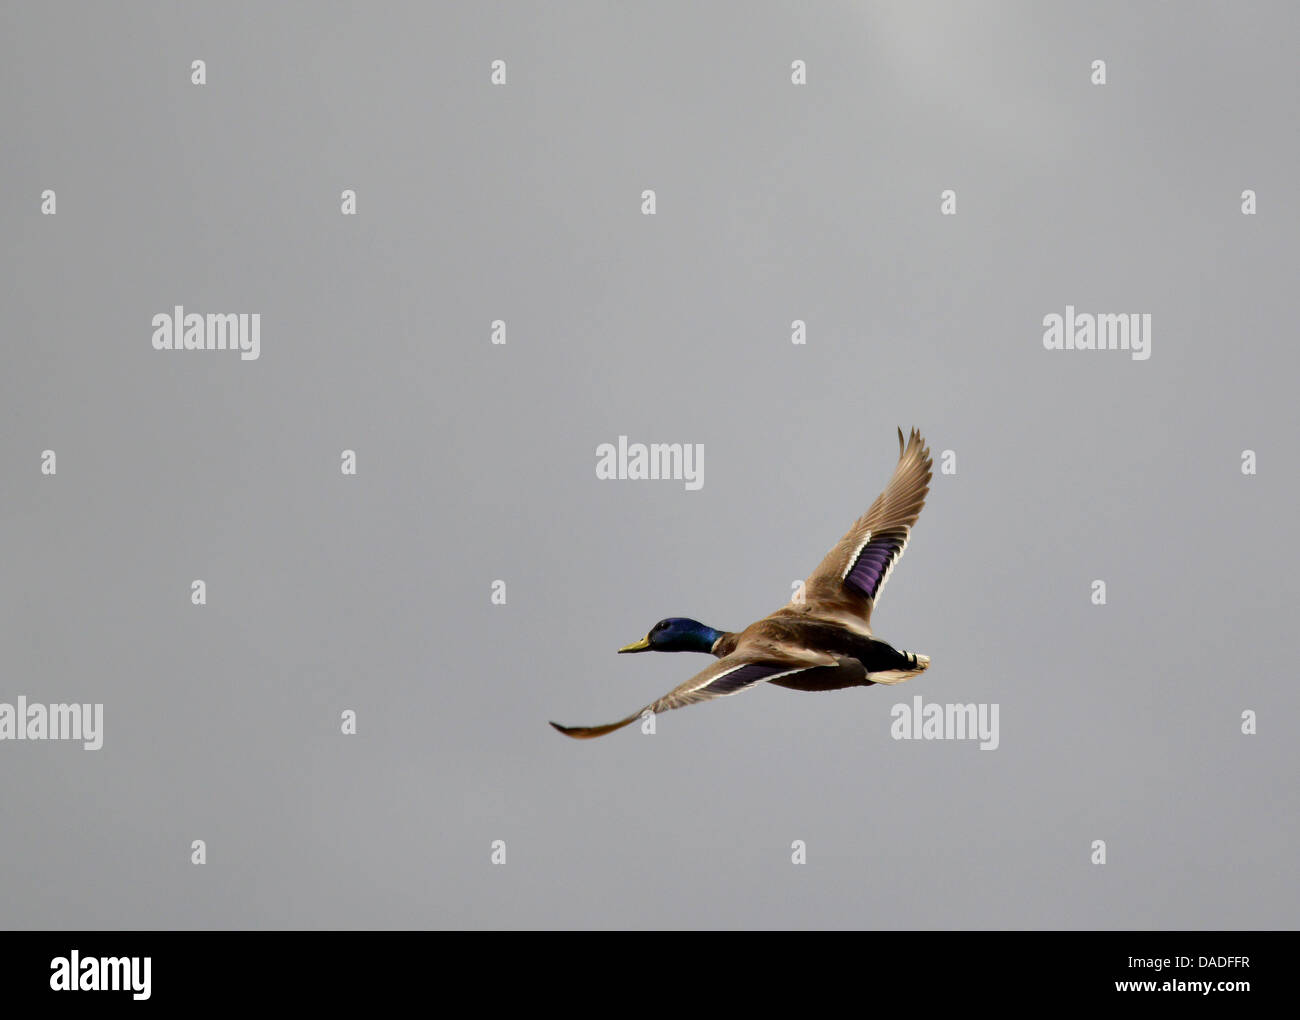 Flying duck - Stock Image